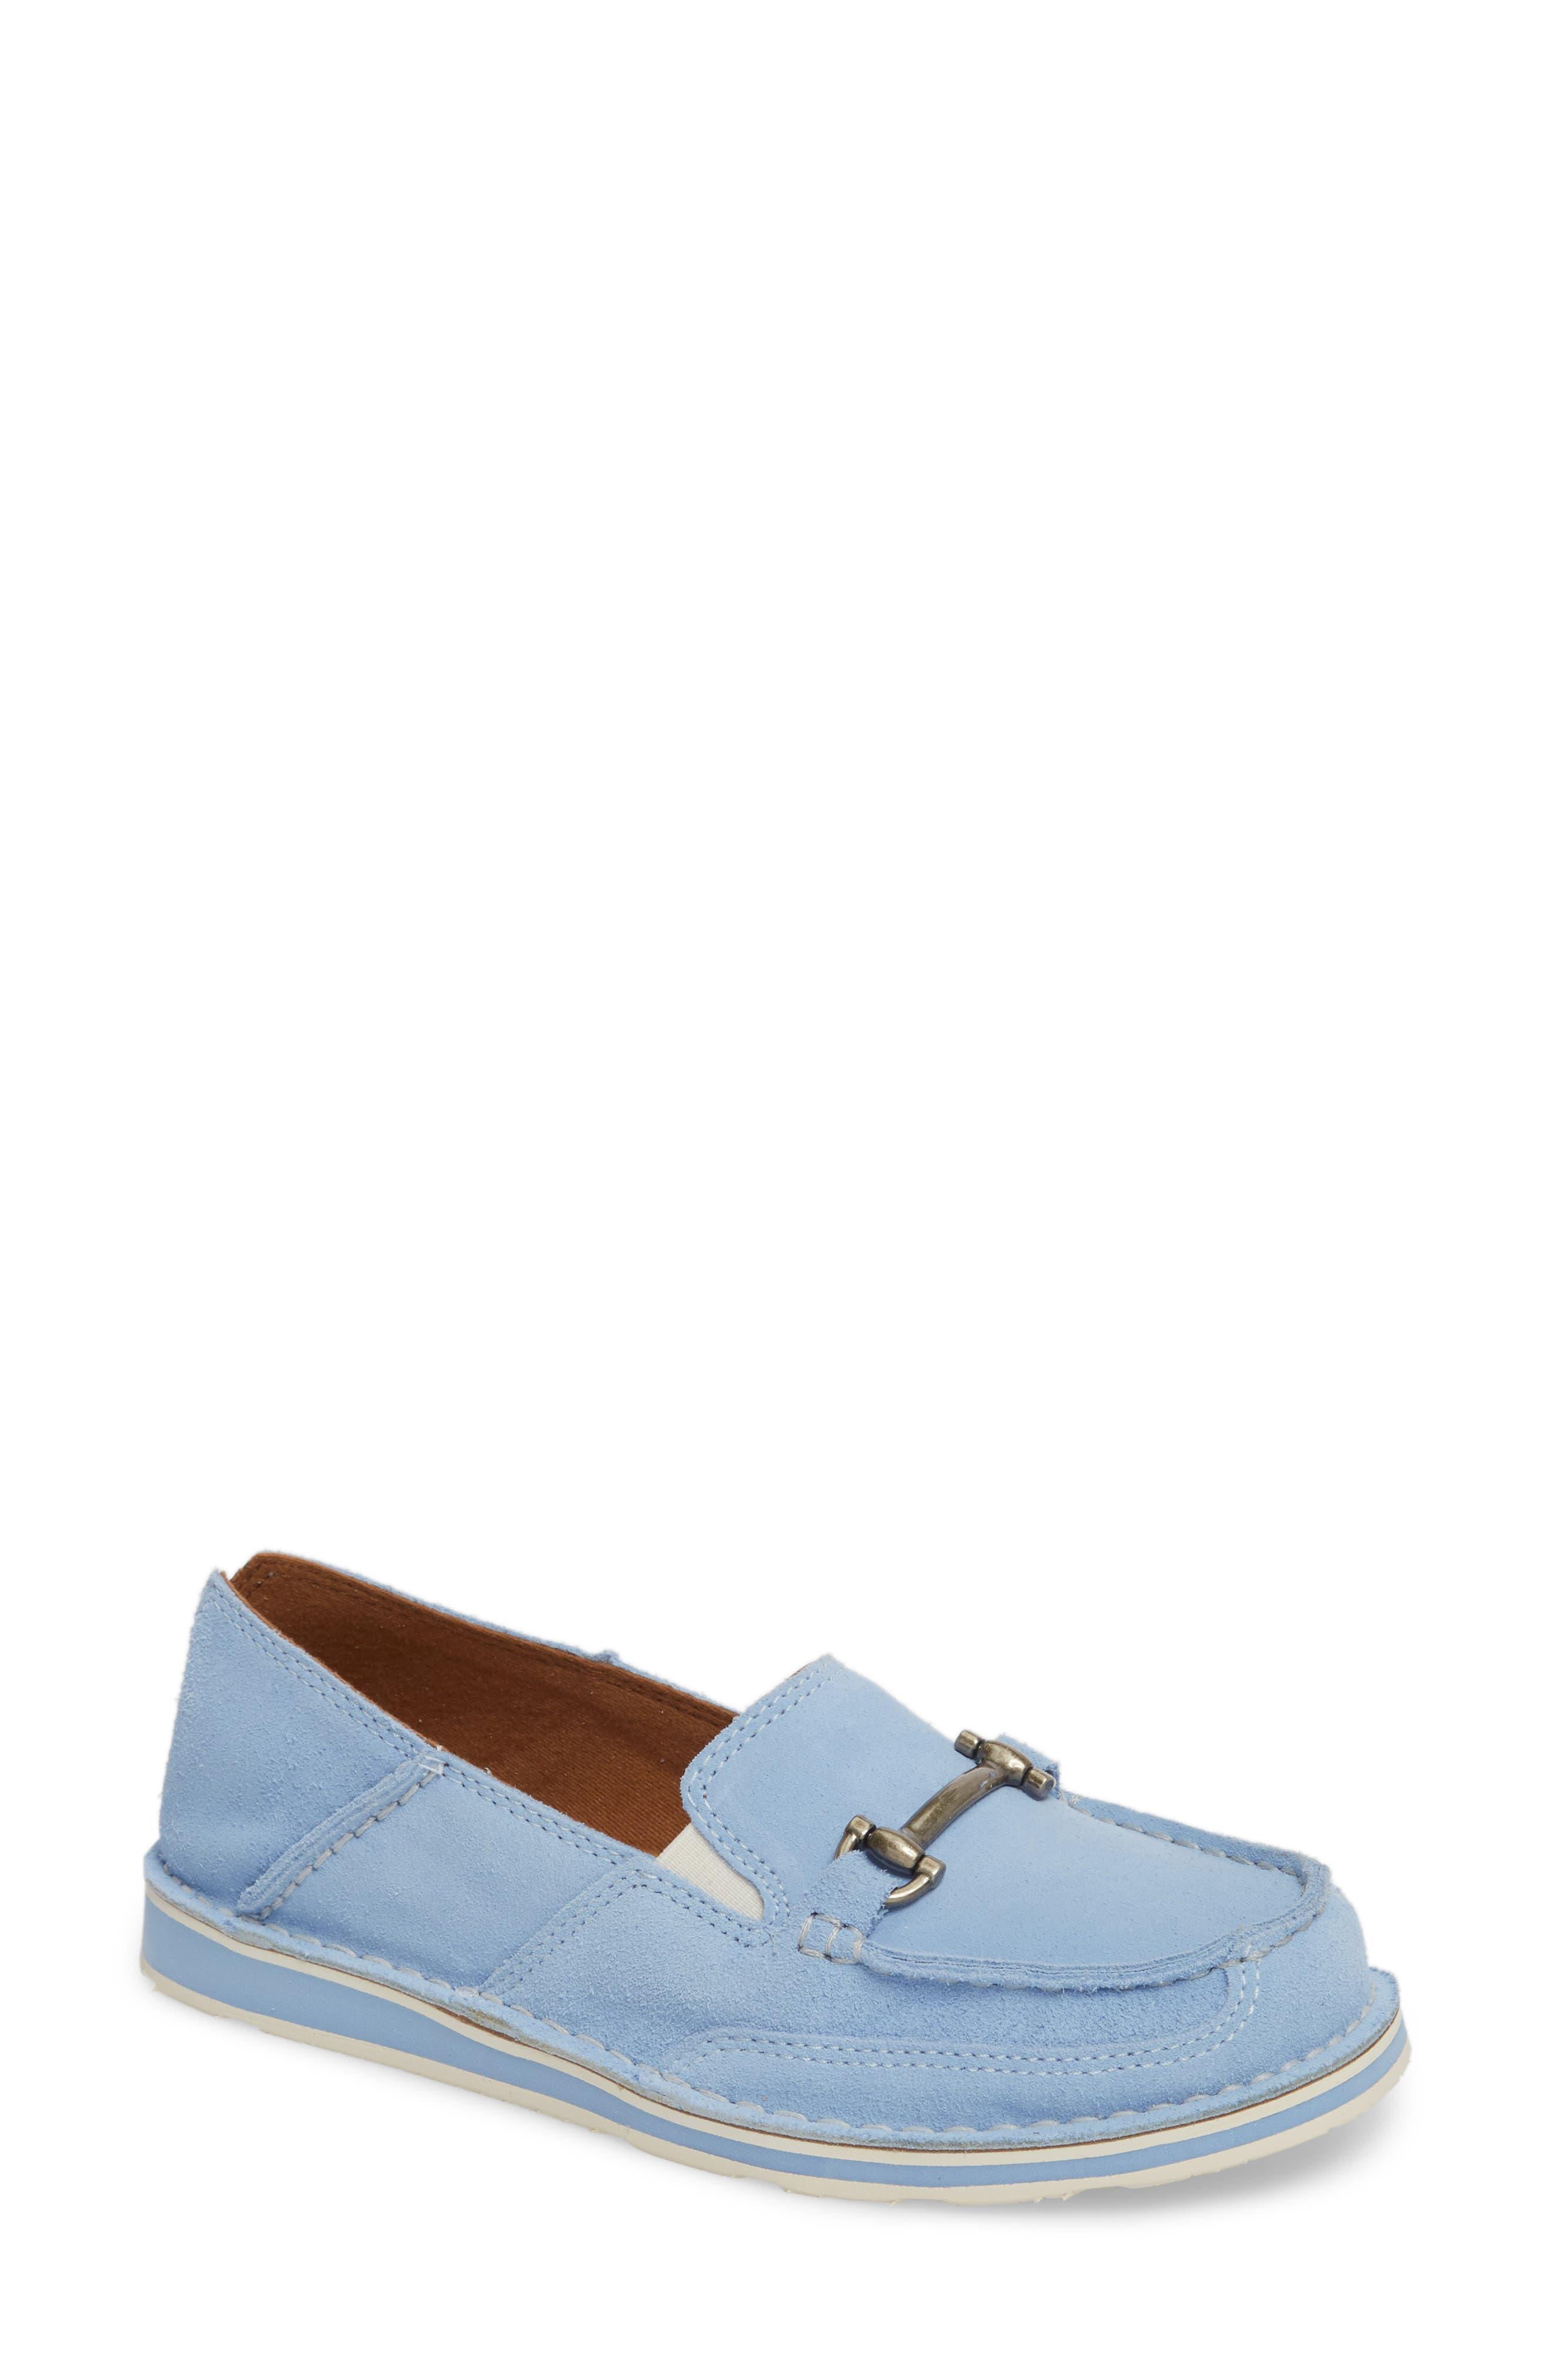 Cruiser Castaway Loafer, Baby Blue Suede